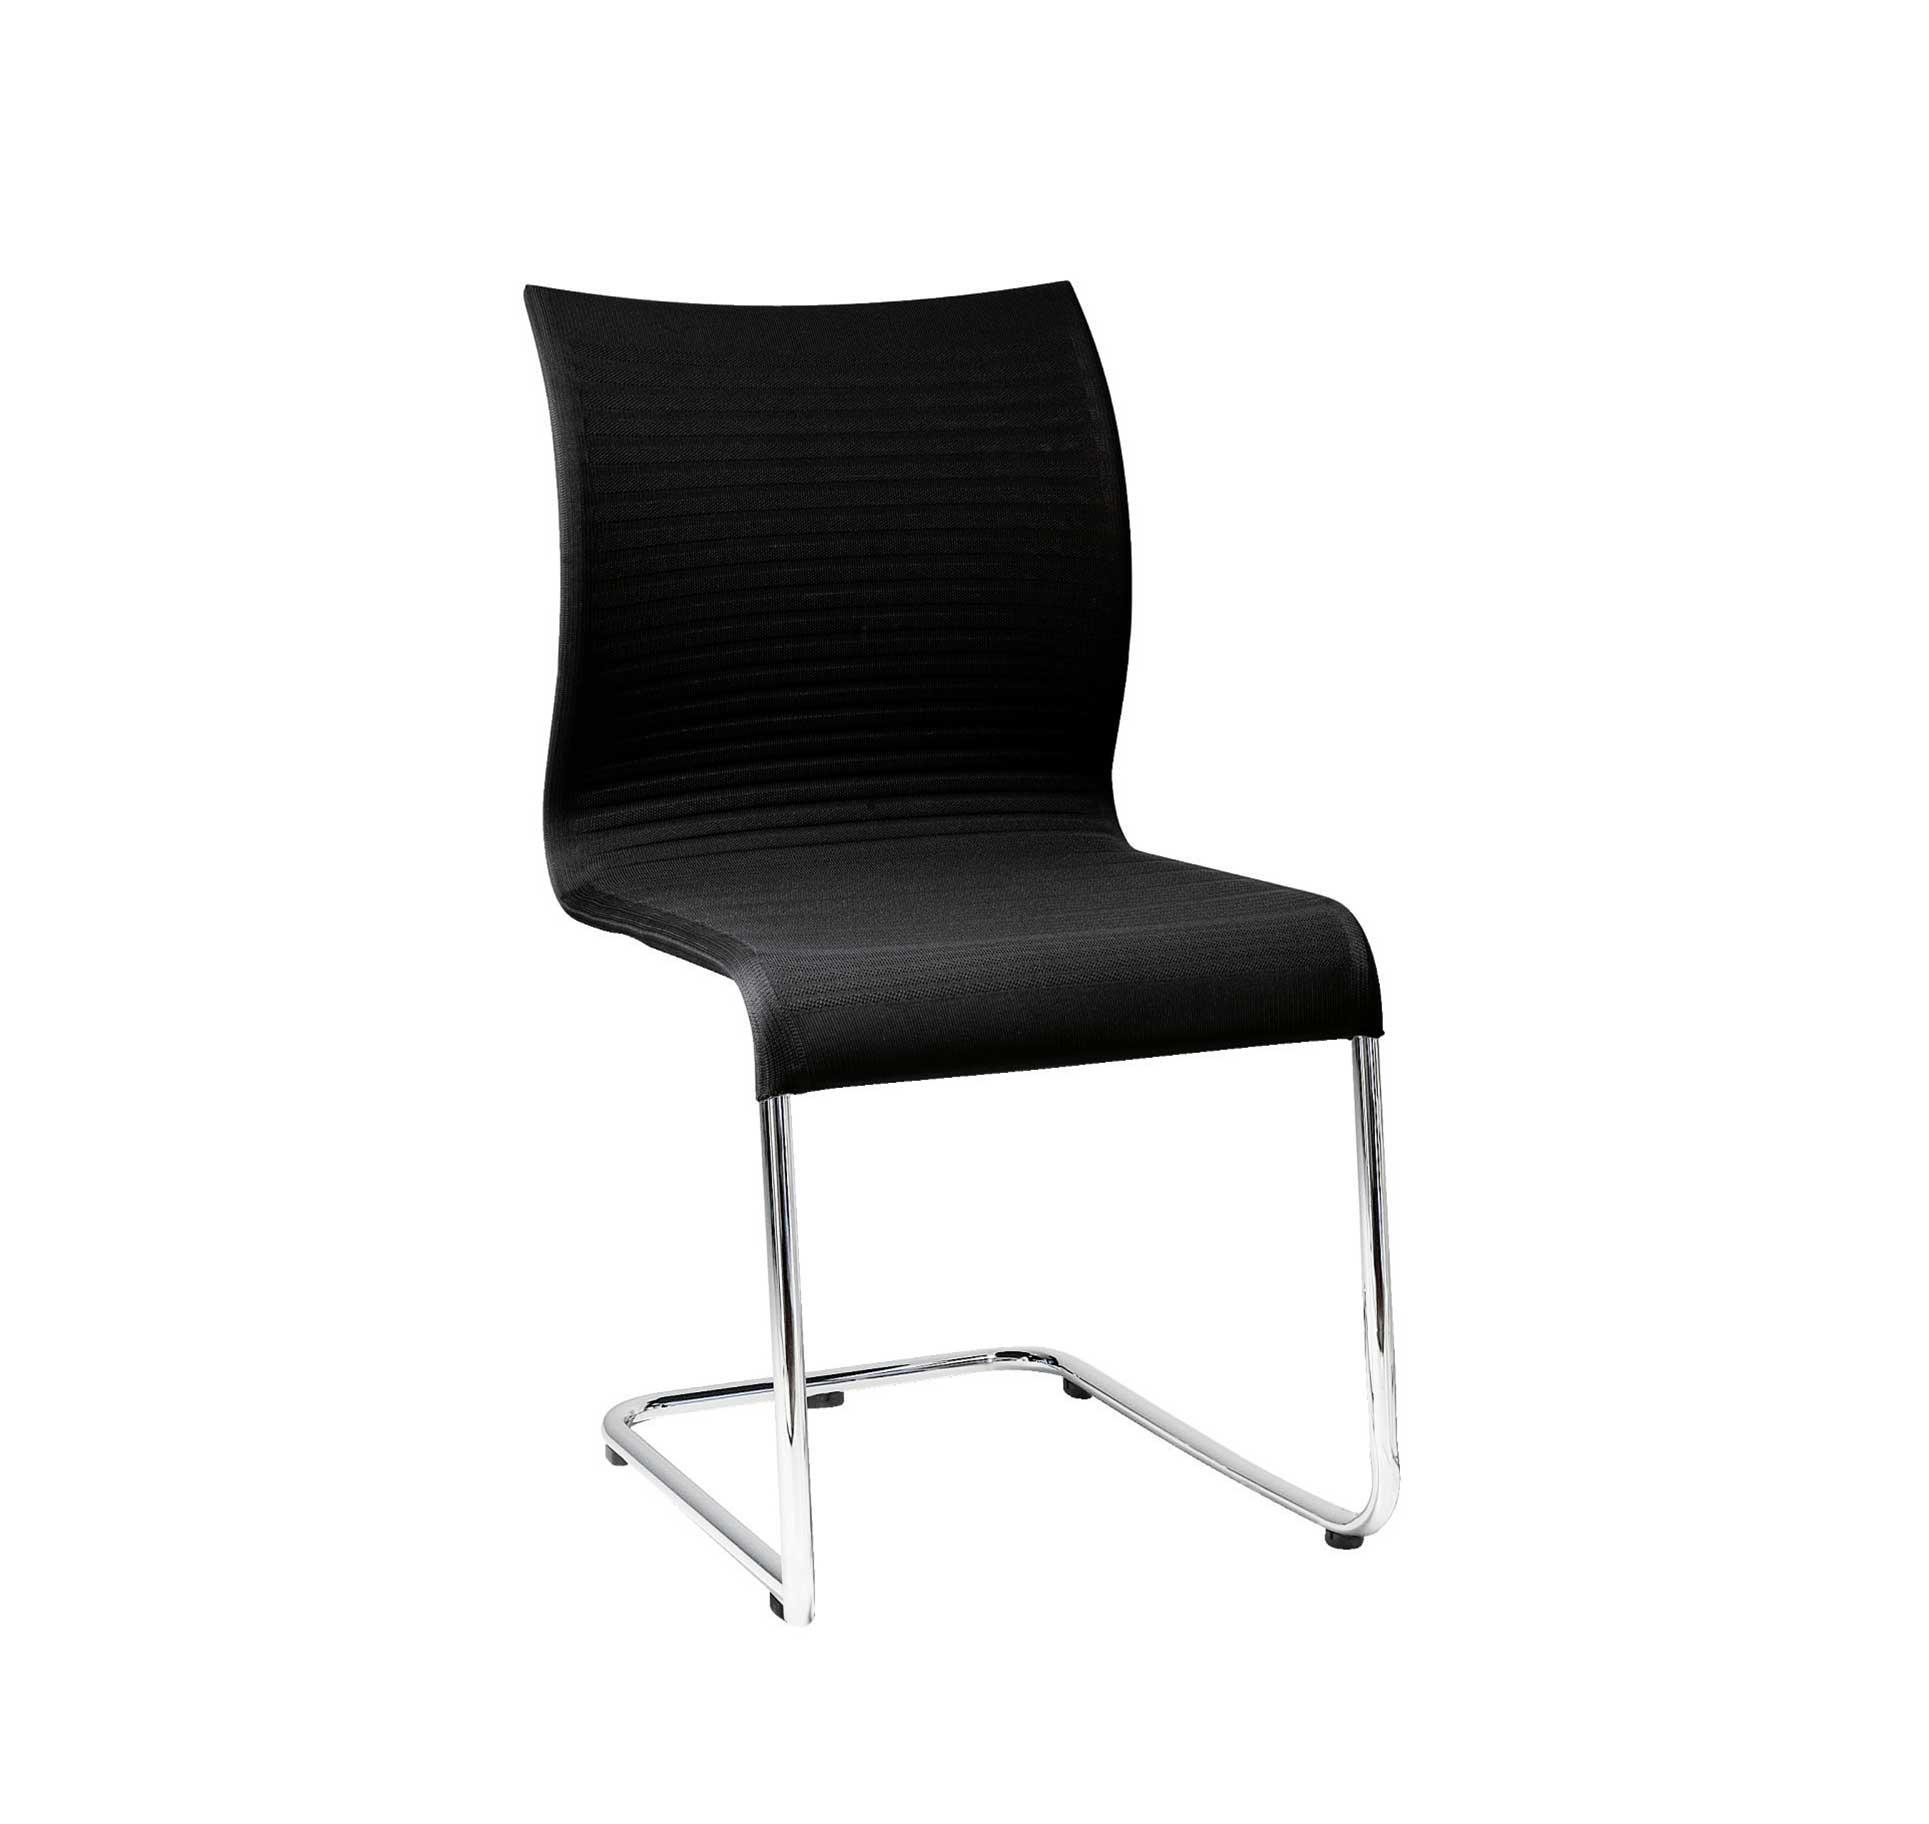 now by hülsta – dining Stuhl S15 Stühle Esszimmer